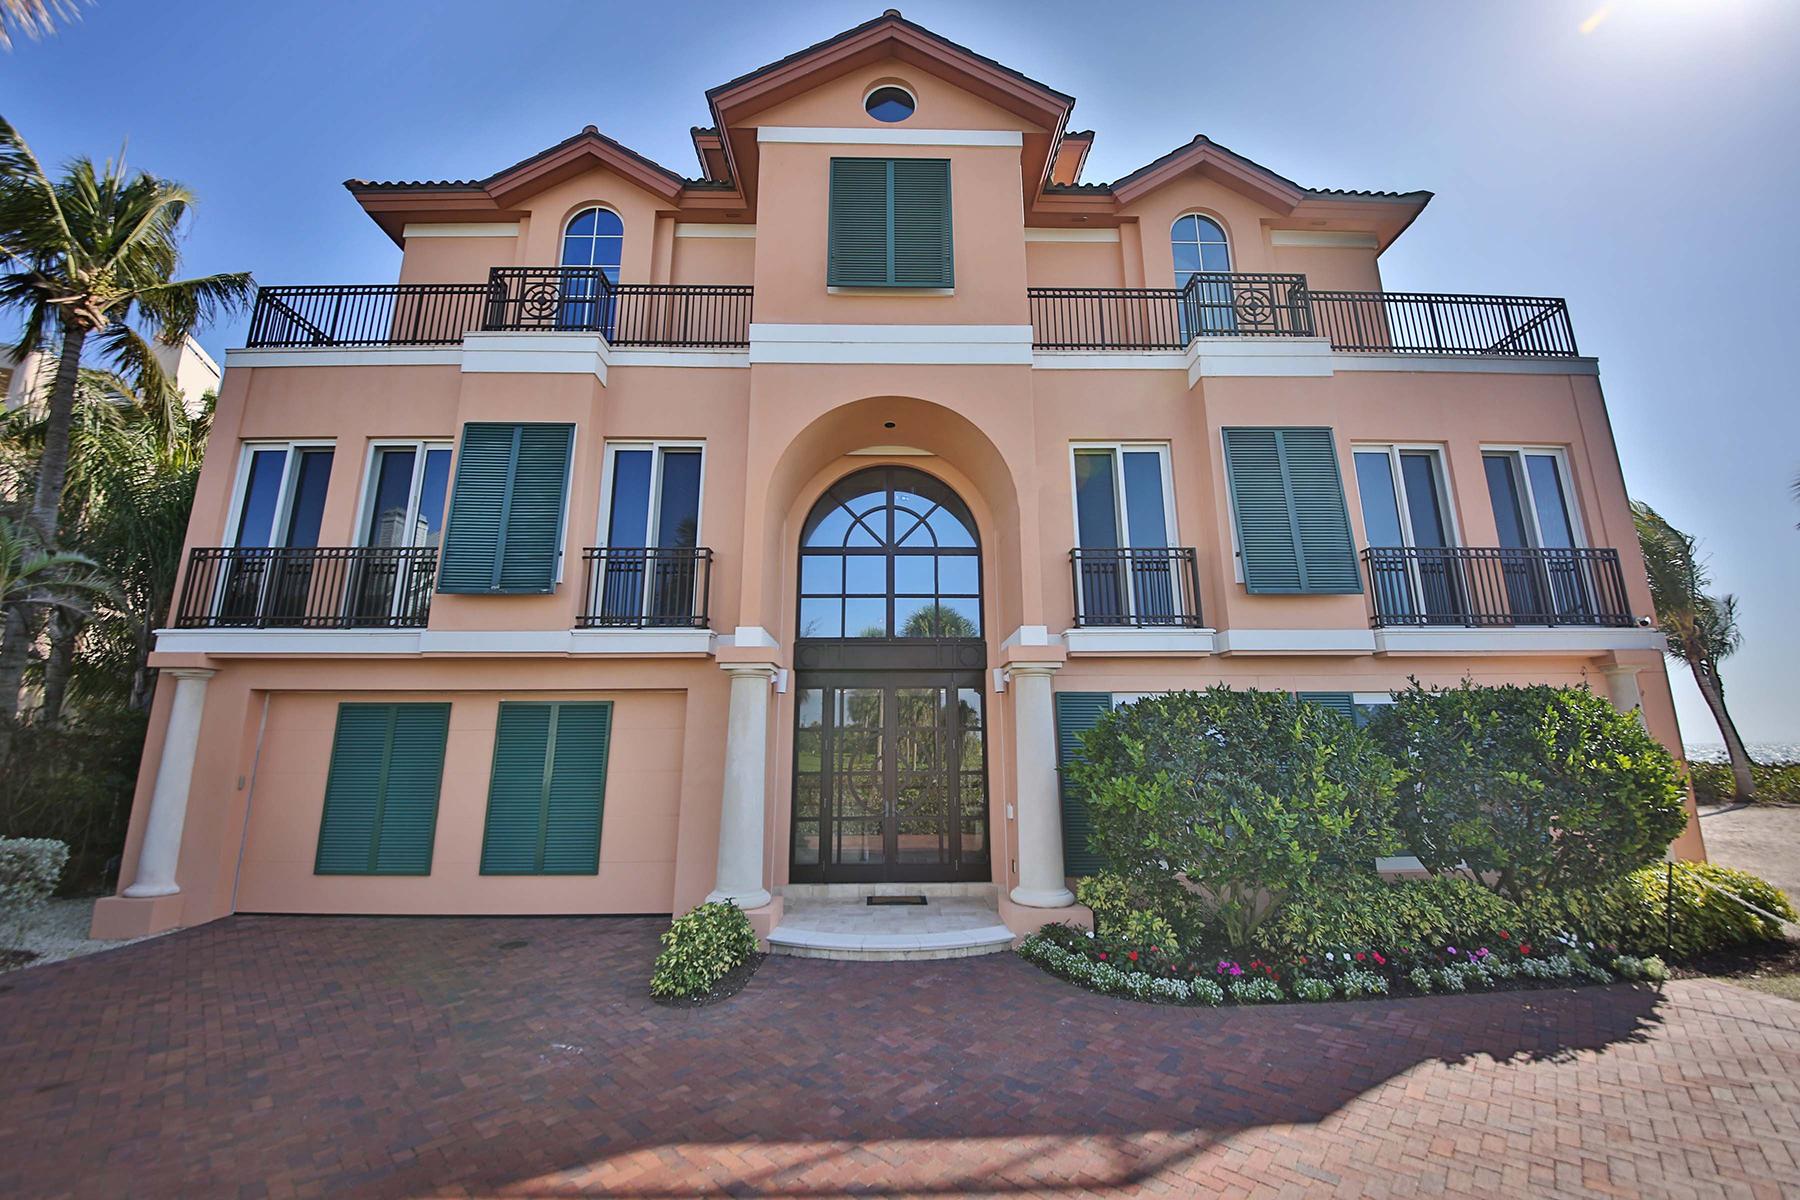 Single Family Home for Rent at BAREFOOT BEACH 114 Anguilla Ln, Bonita Springs, Florida 34134 United States